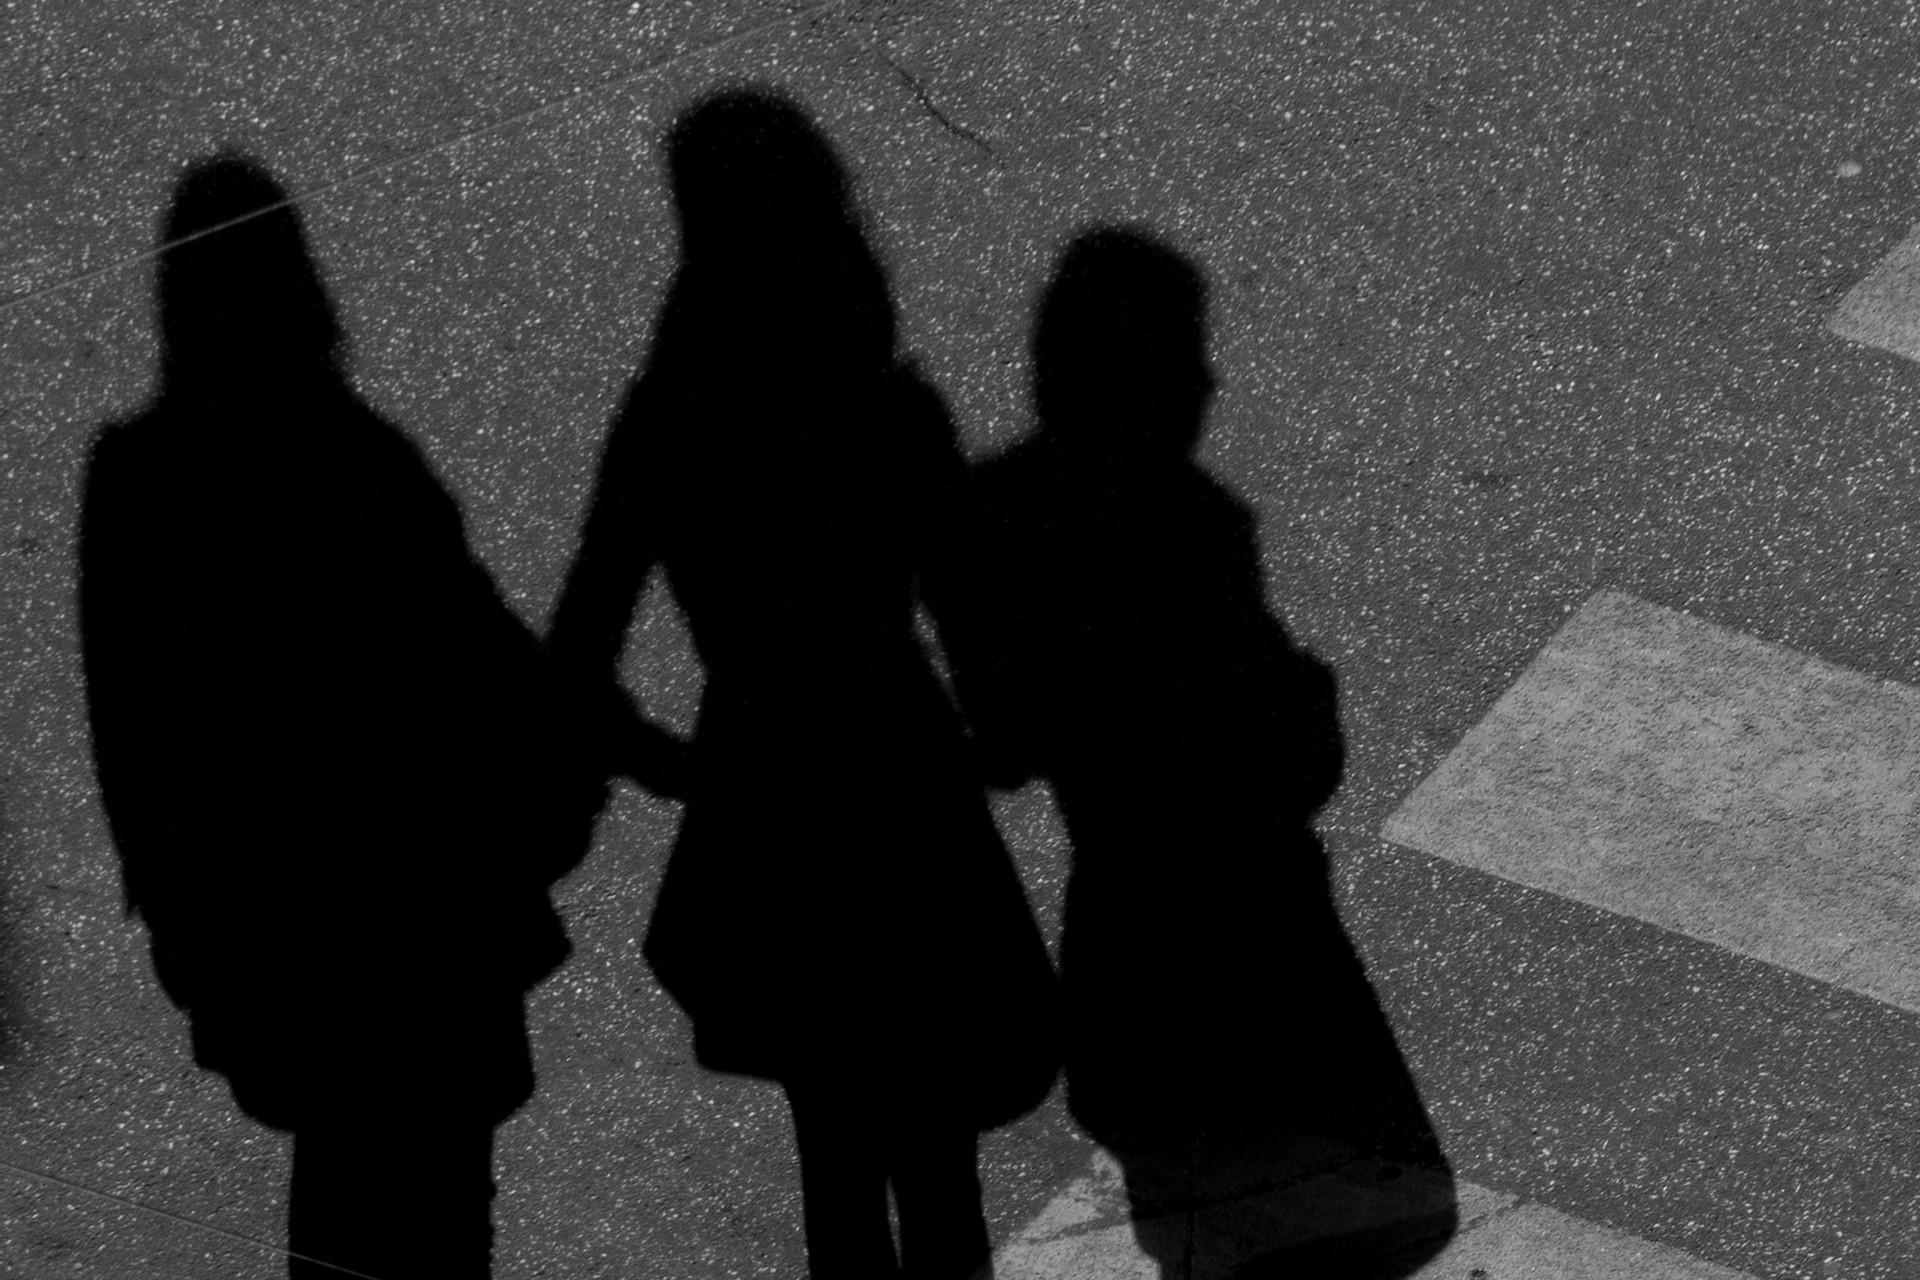 Three women in shadow